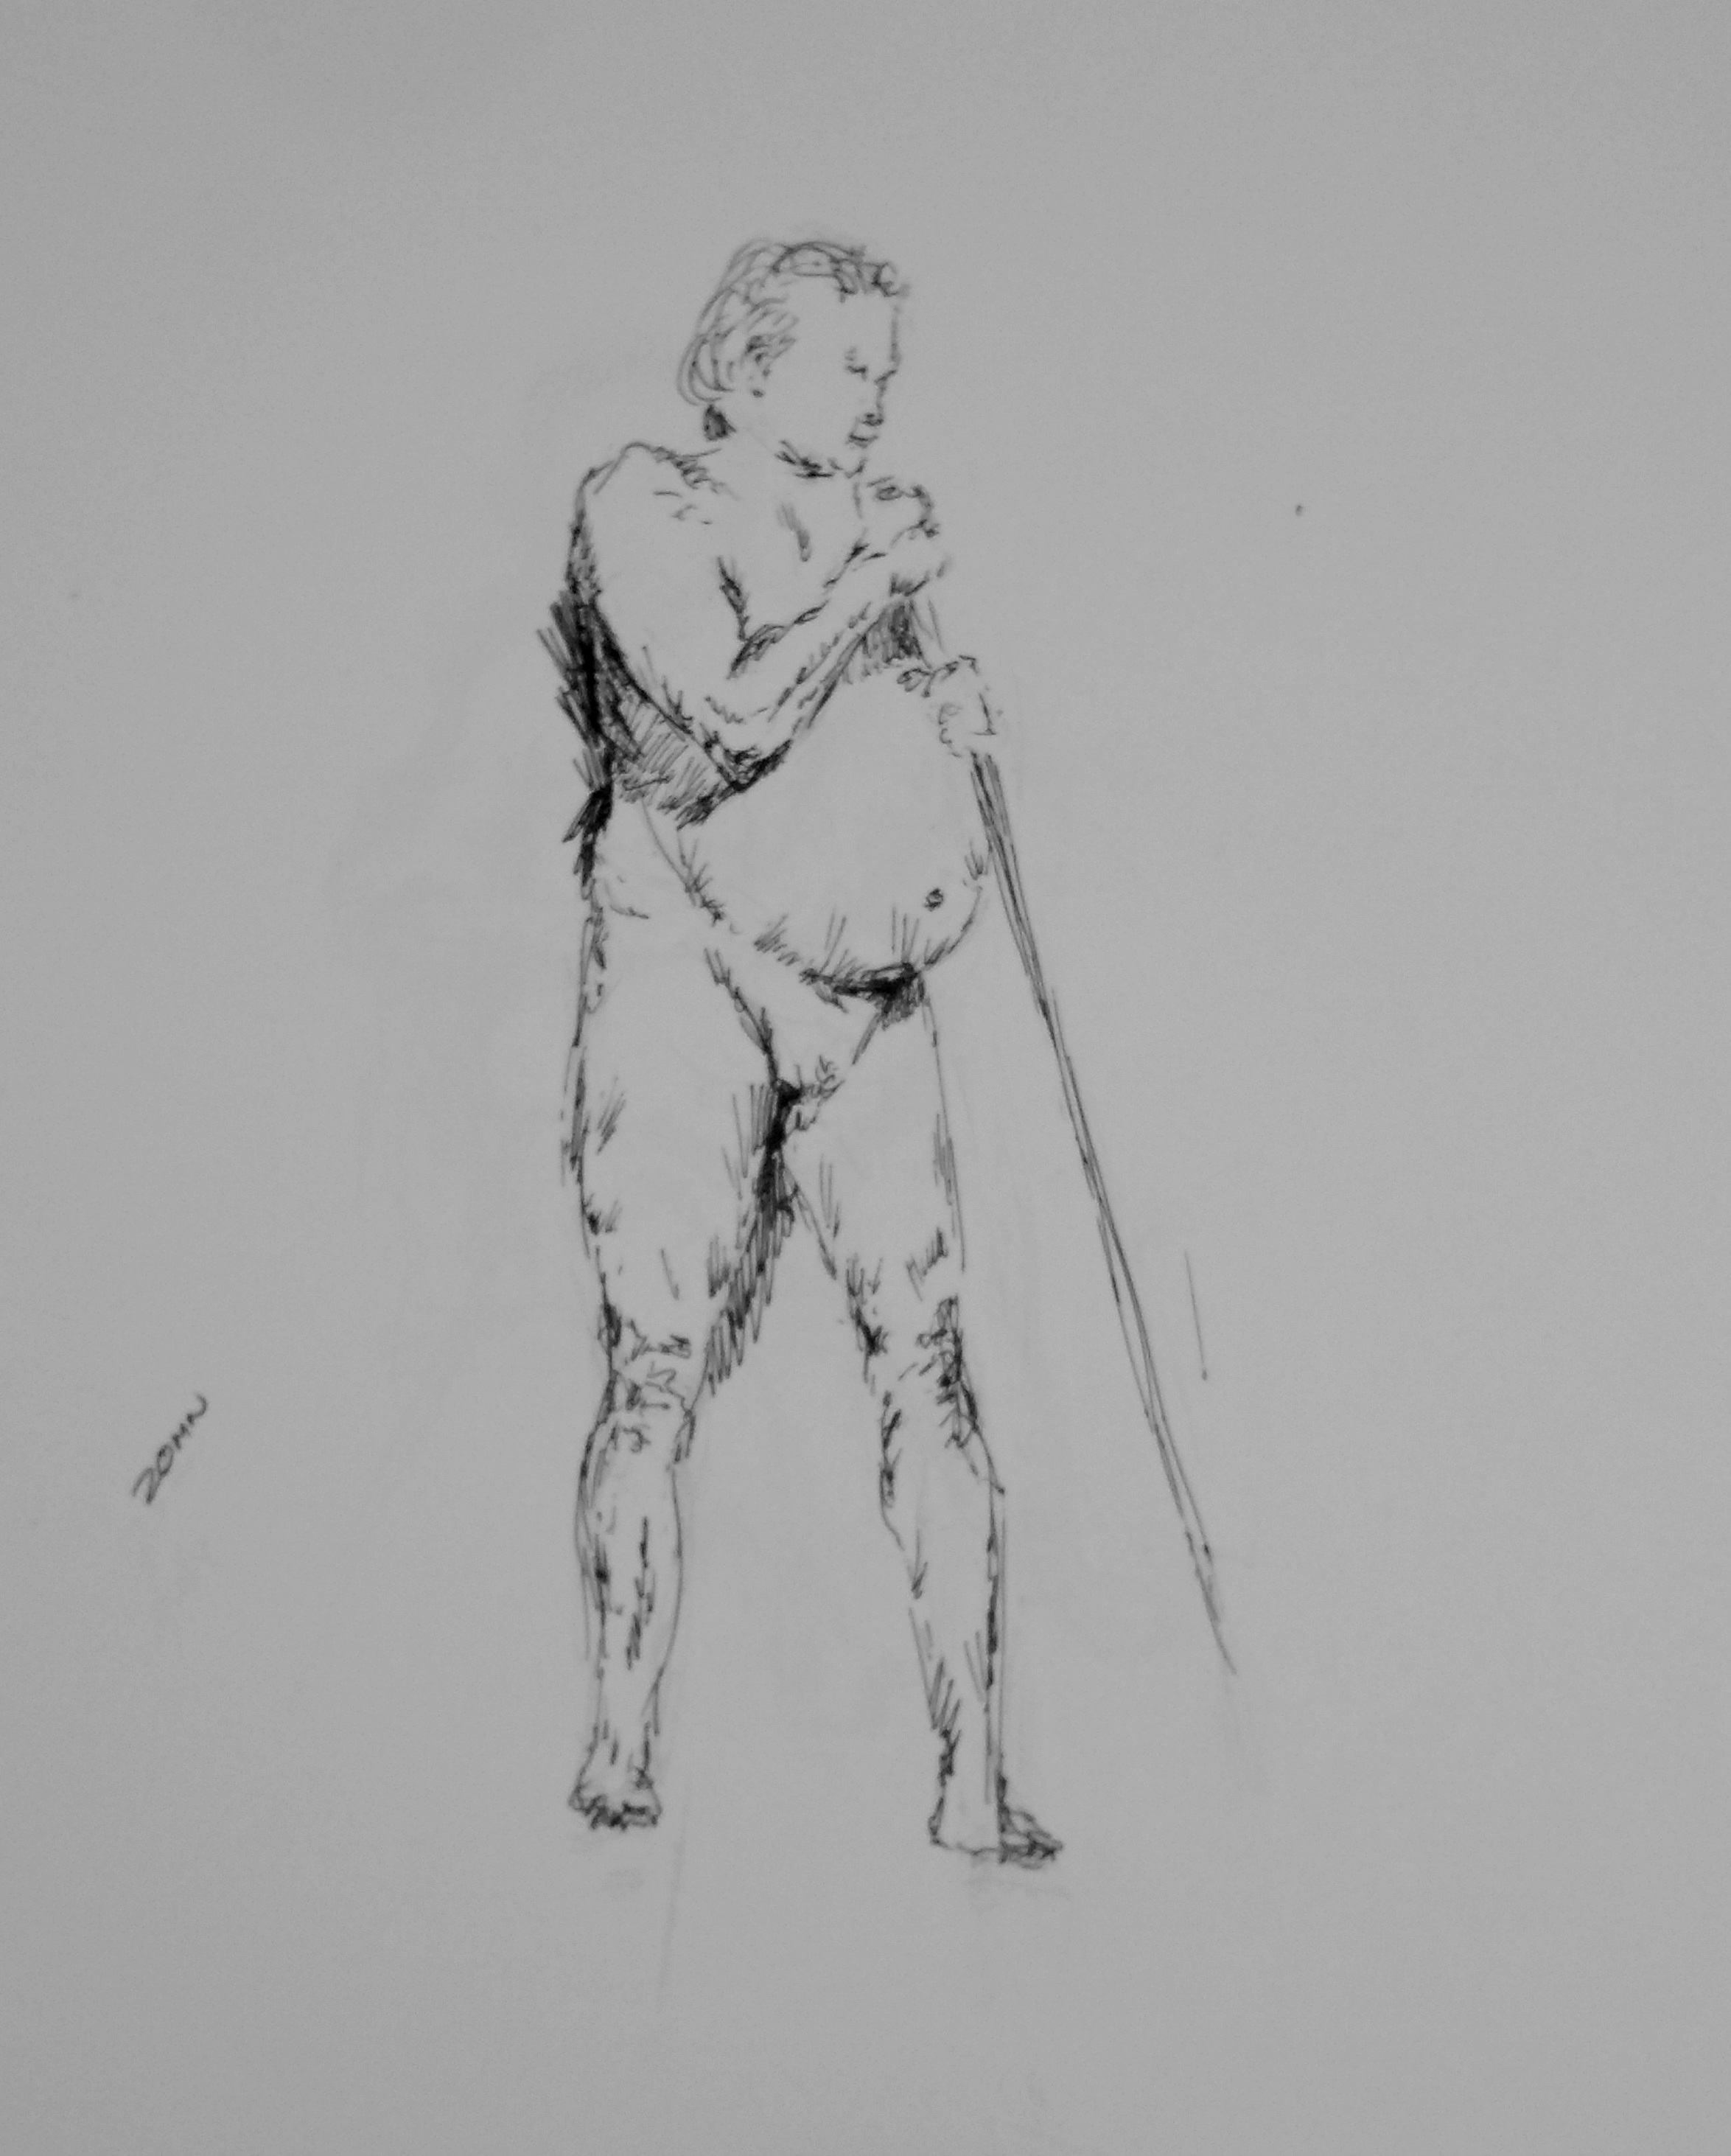 1/12/19 Art Works Figured drawing session, John Huisman